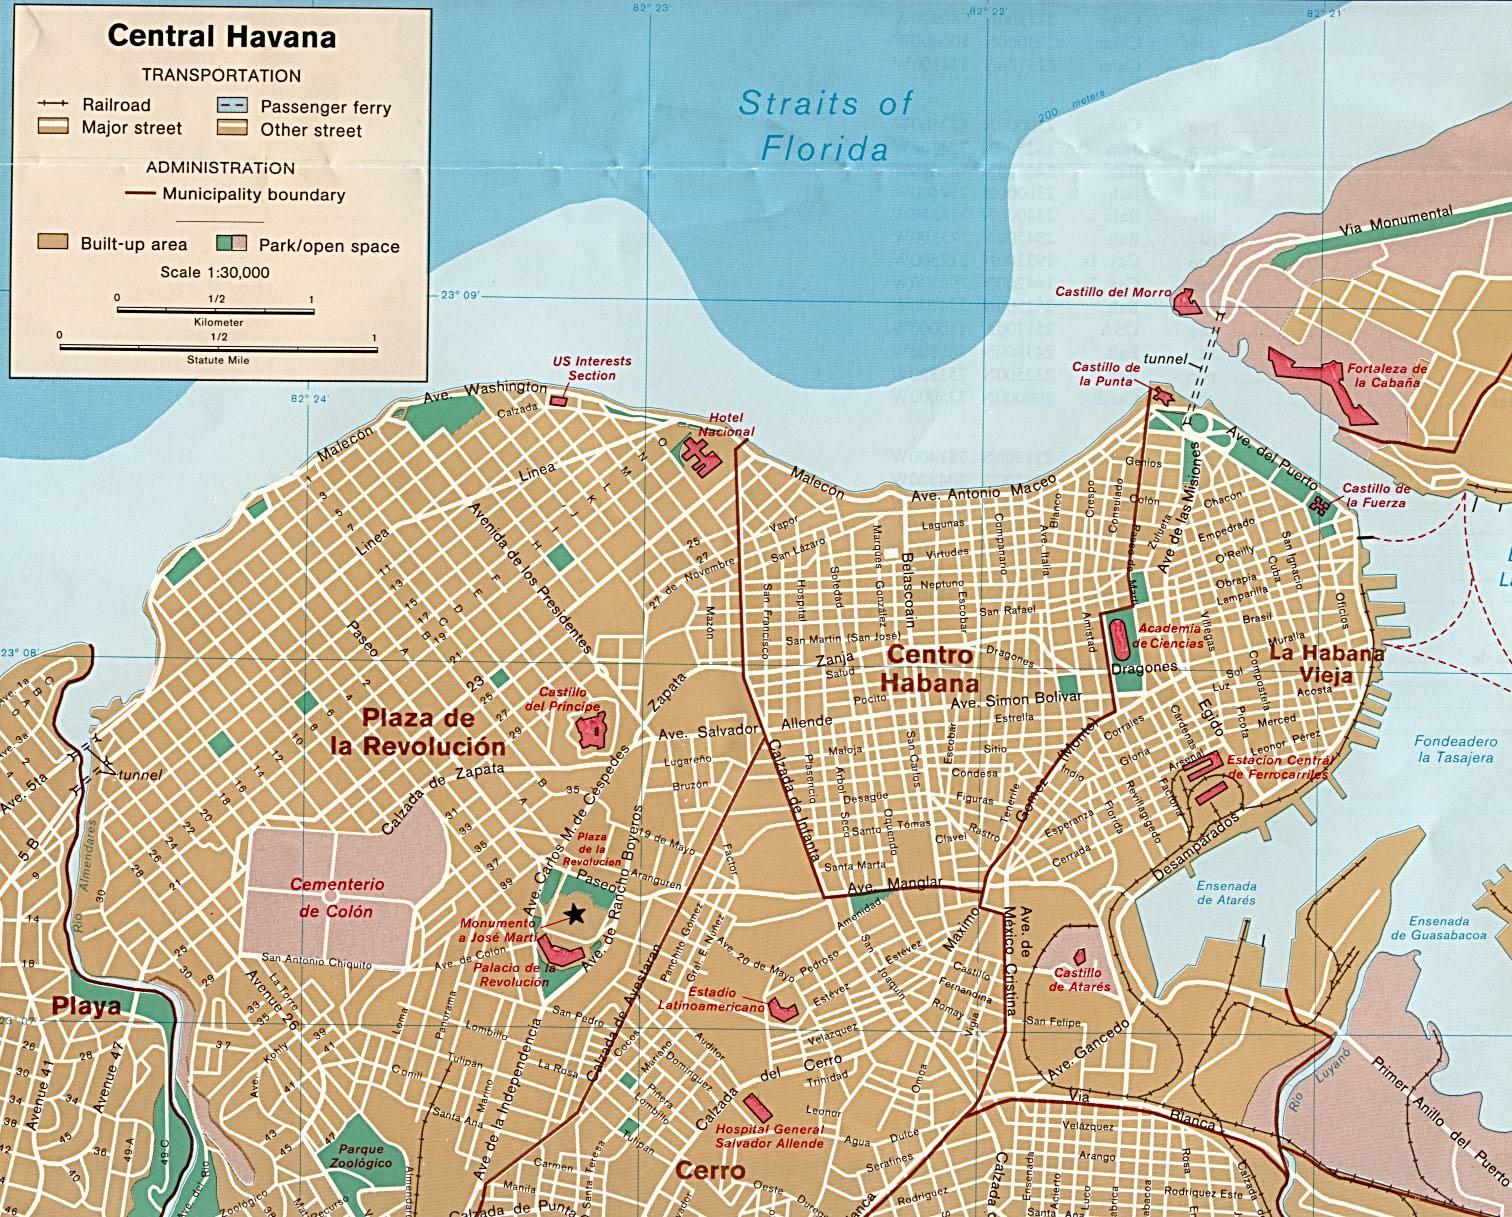 Mapa de Havana